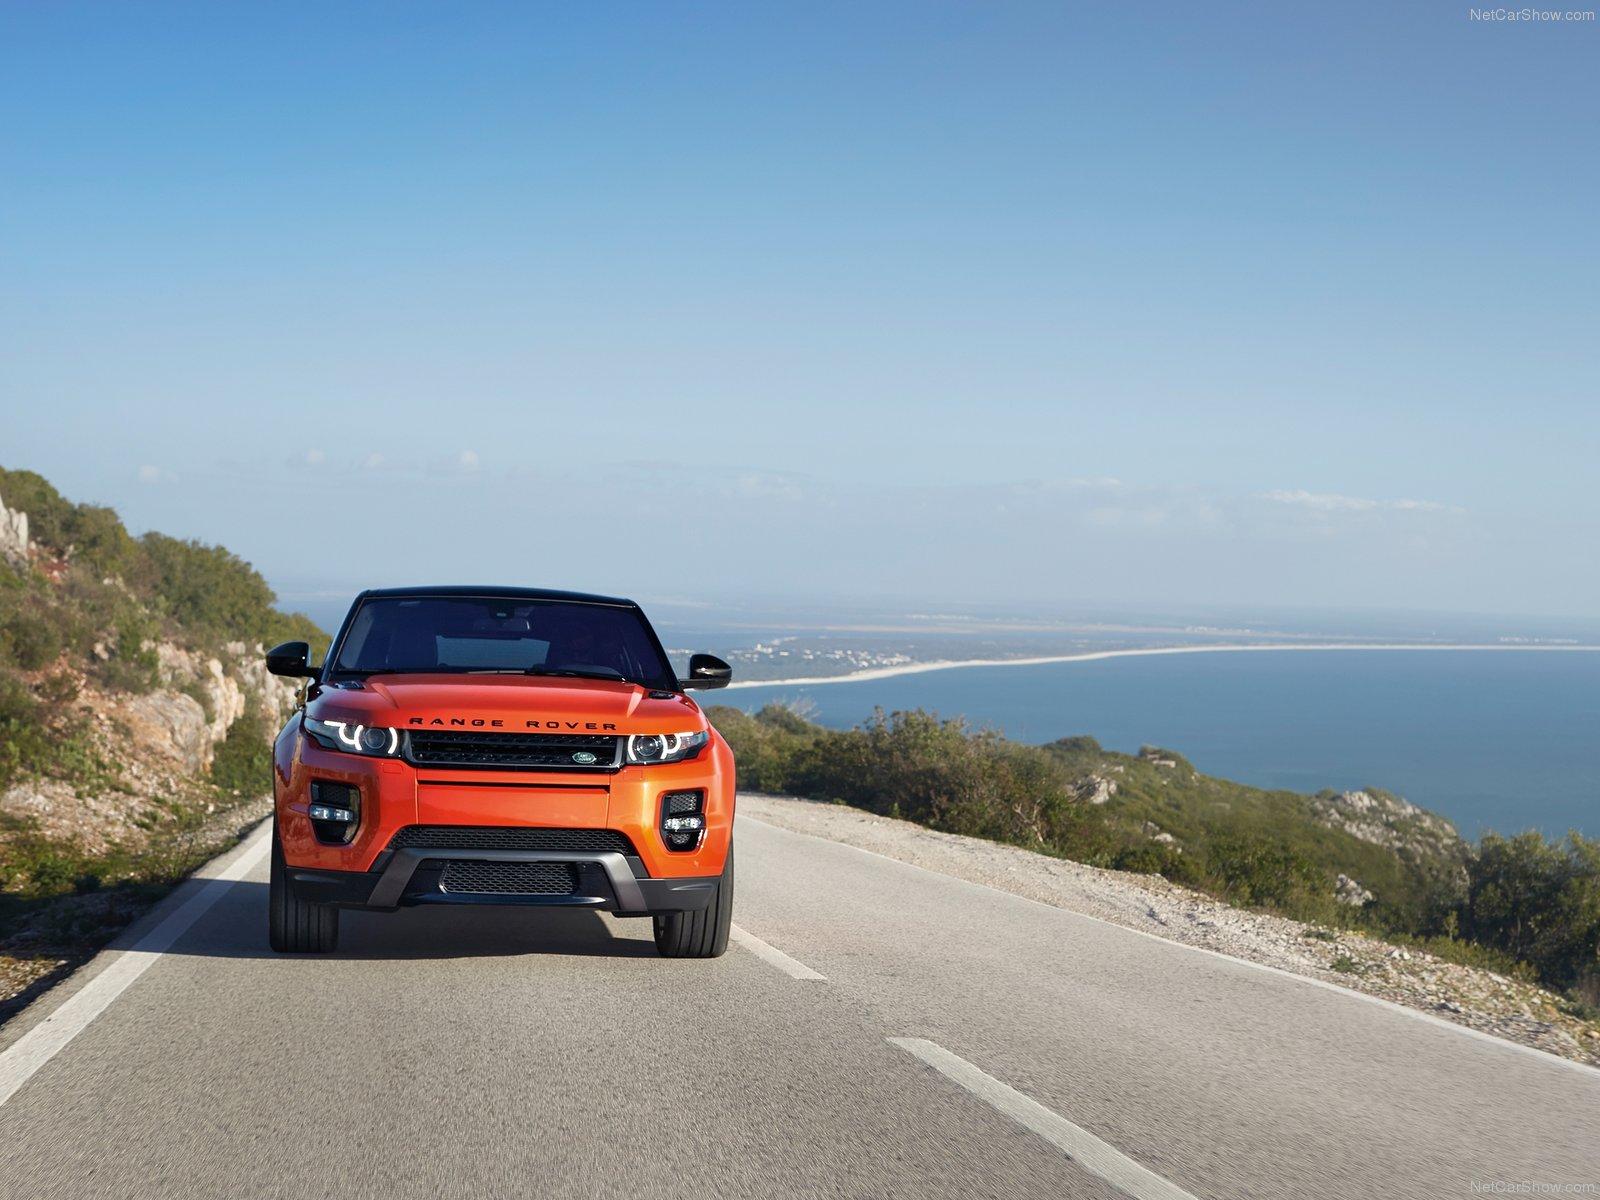 https://www.carsbase.com/photo/Land_Rover-Range_Rover_Evoque_Autobiography_Dynamic_mp29_pic_110450.jpg